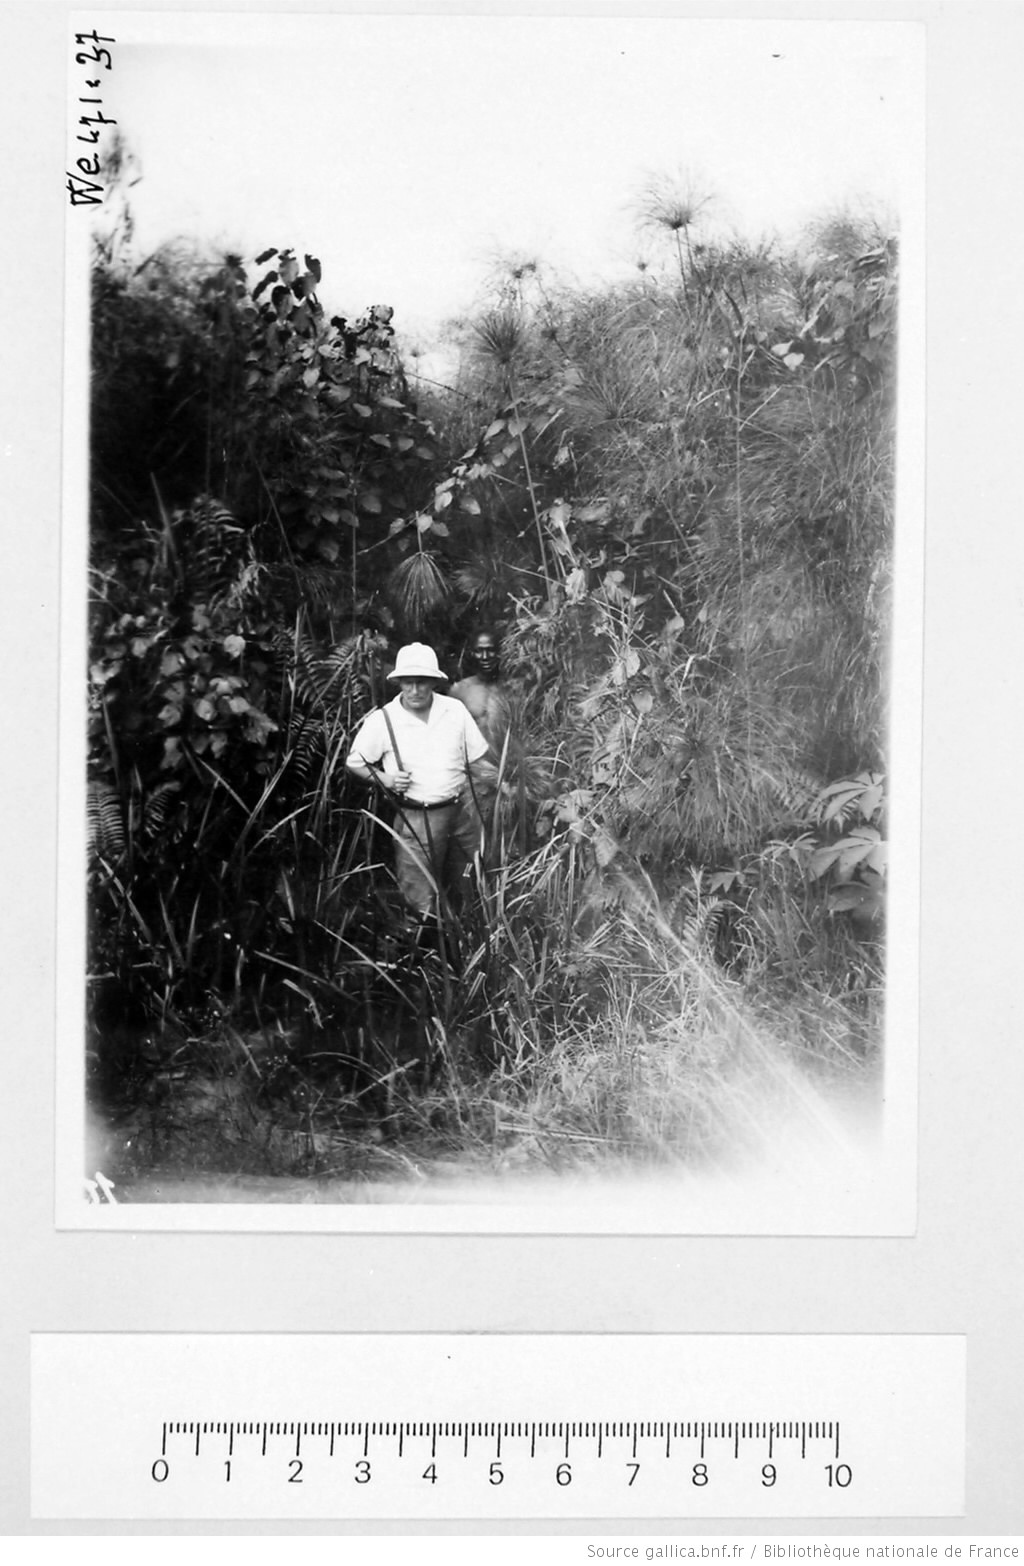 [39 phot. d'A.E.F. en 1924. Enregistré en 1936] - 35